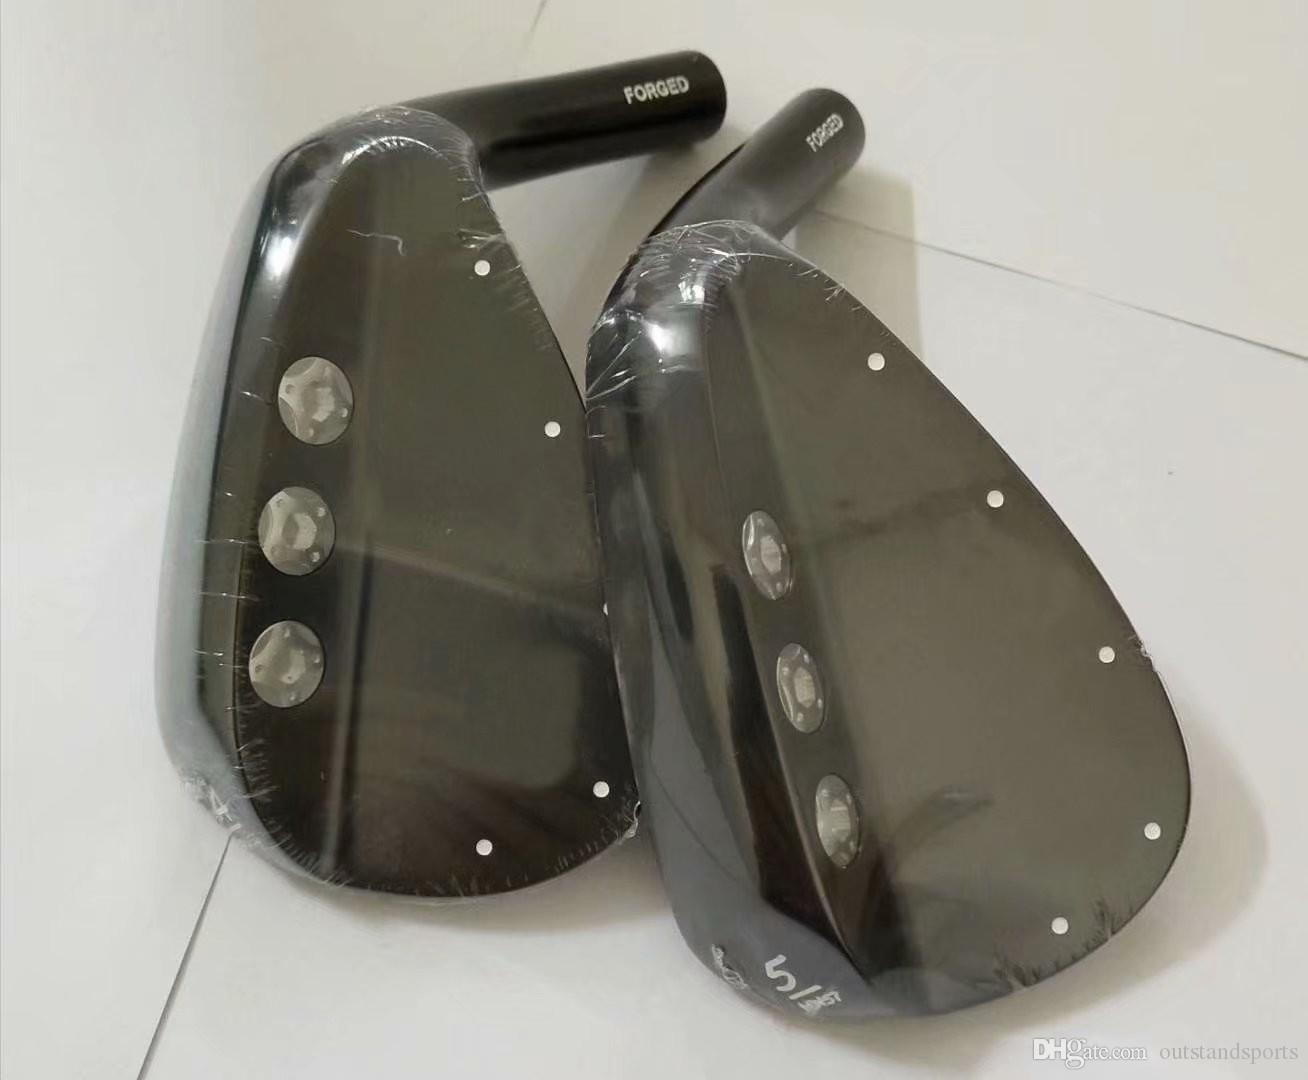 JB501 schwarz fertiger Golfeisenkopfsatz (7pcs / lot) 6-9,1-3 # Weicheisen geschmiedeter Golfeisenkopfsatz Tropfenverschiffengroßverkauf Soem vorhanden